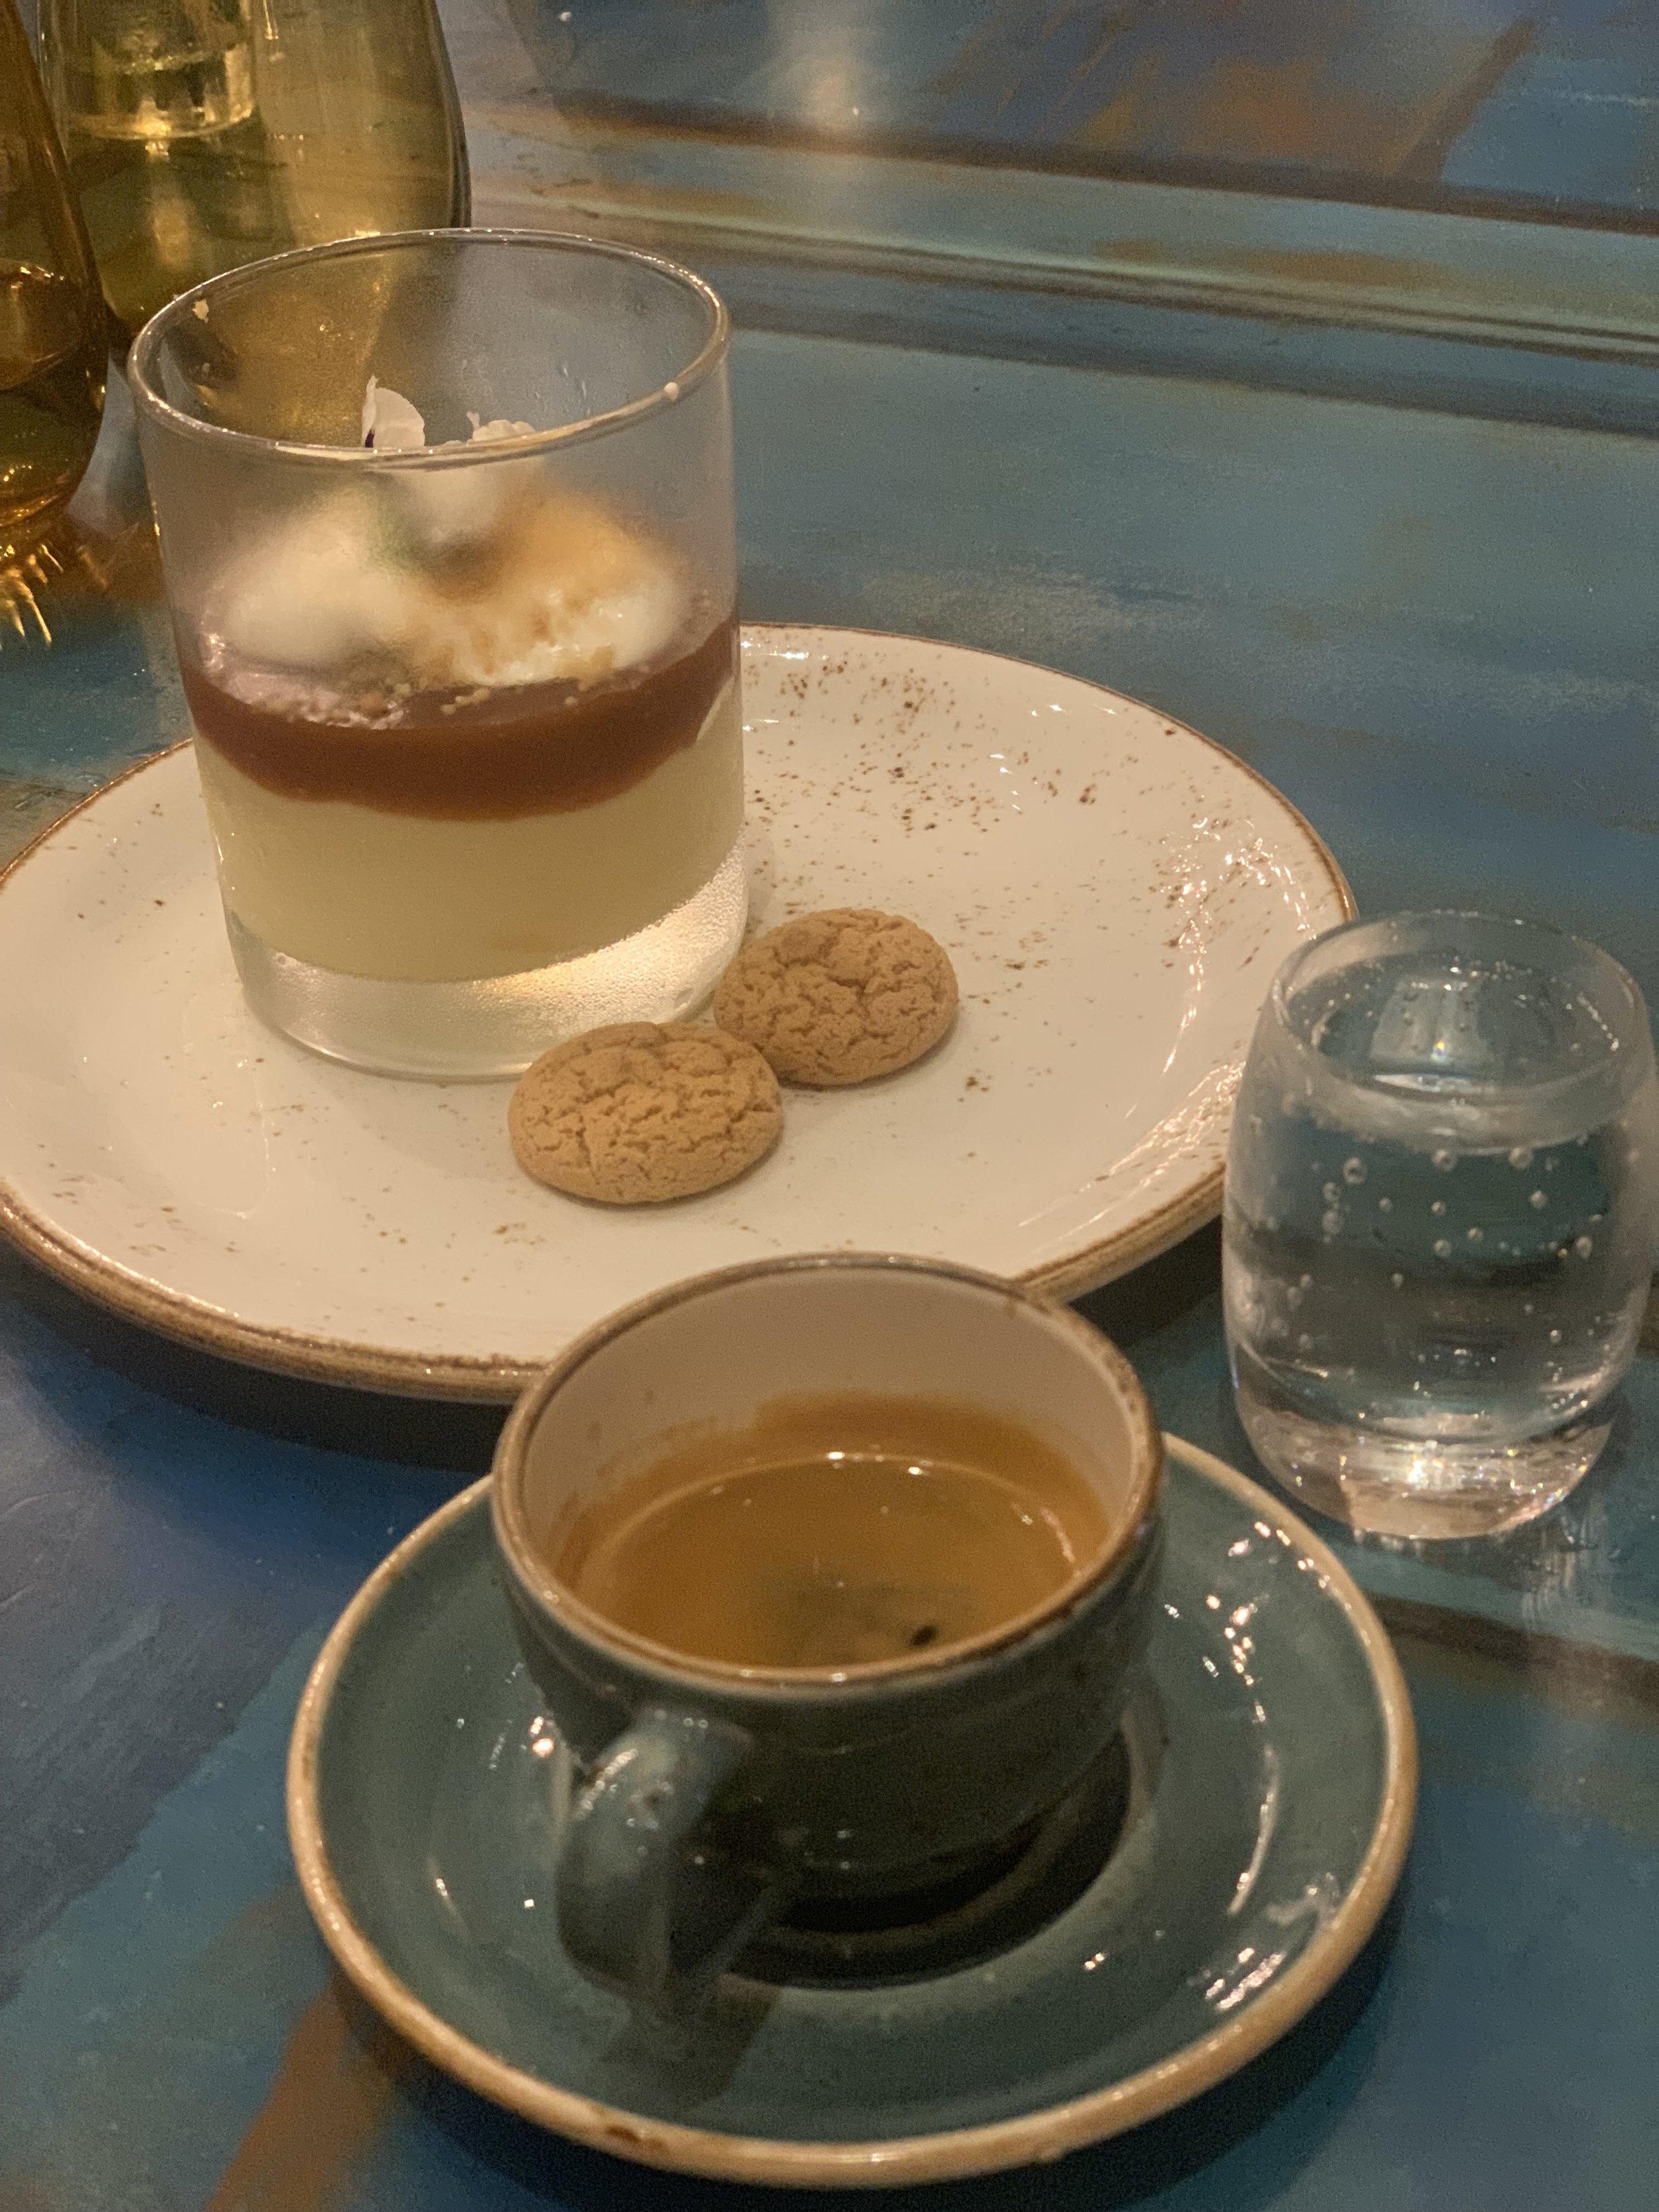 Espresso w/ Sparkling Palate Cleanser